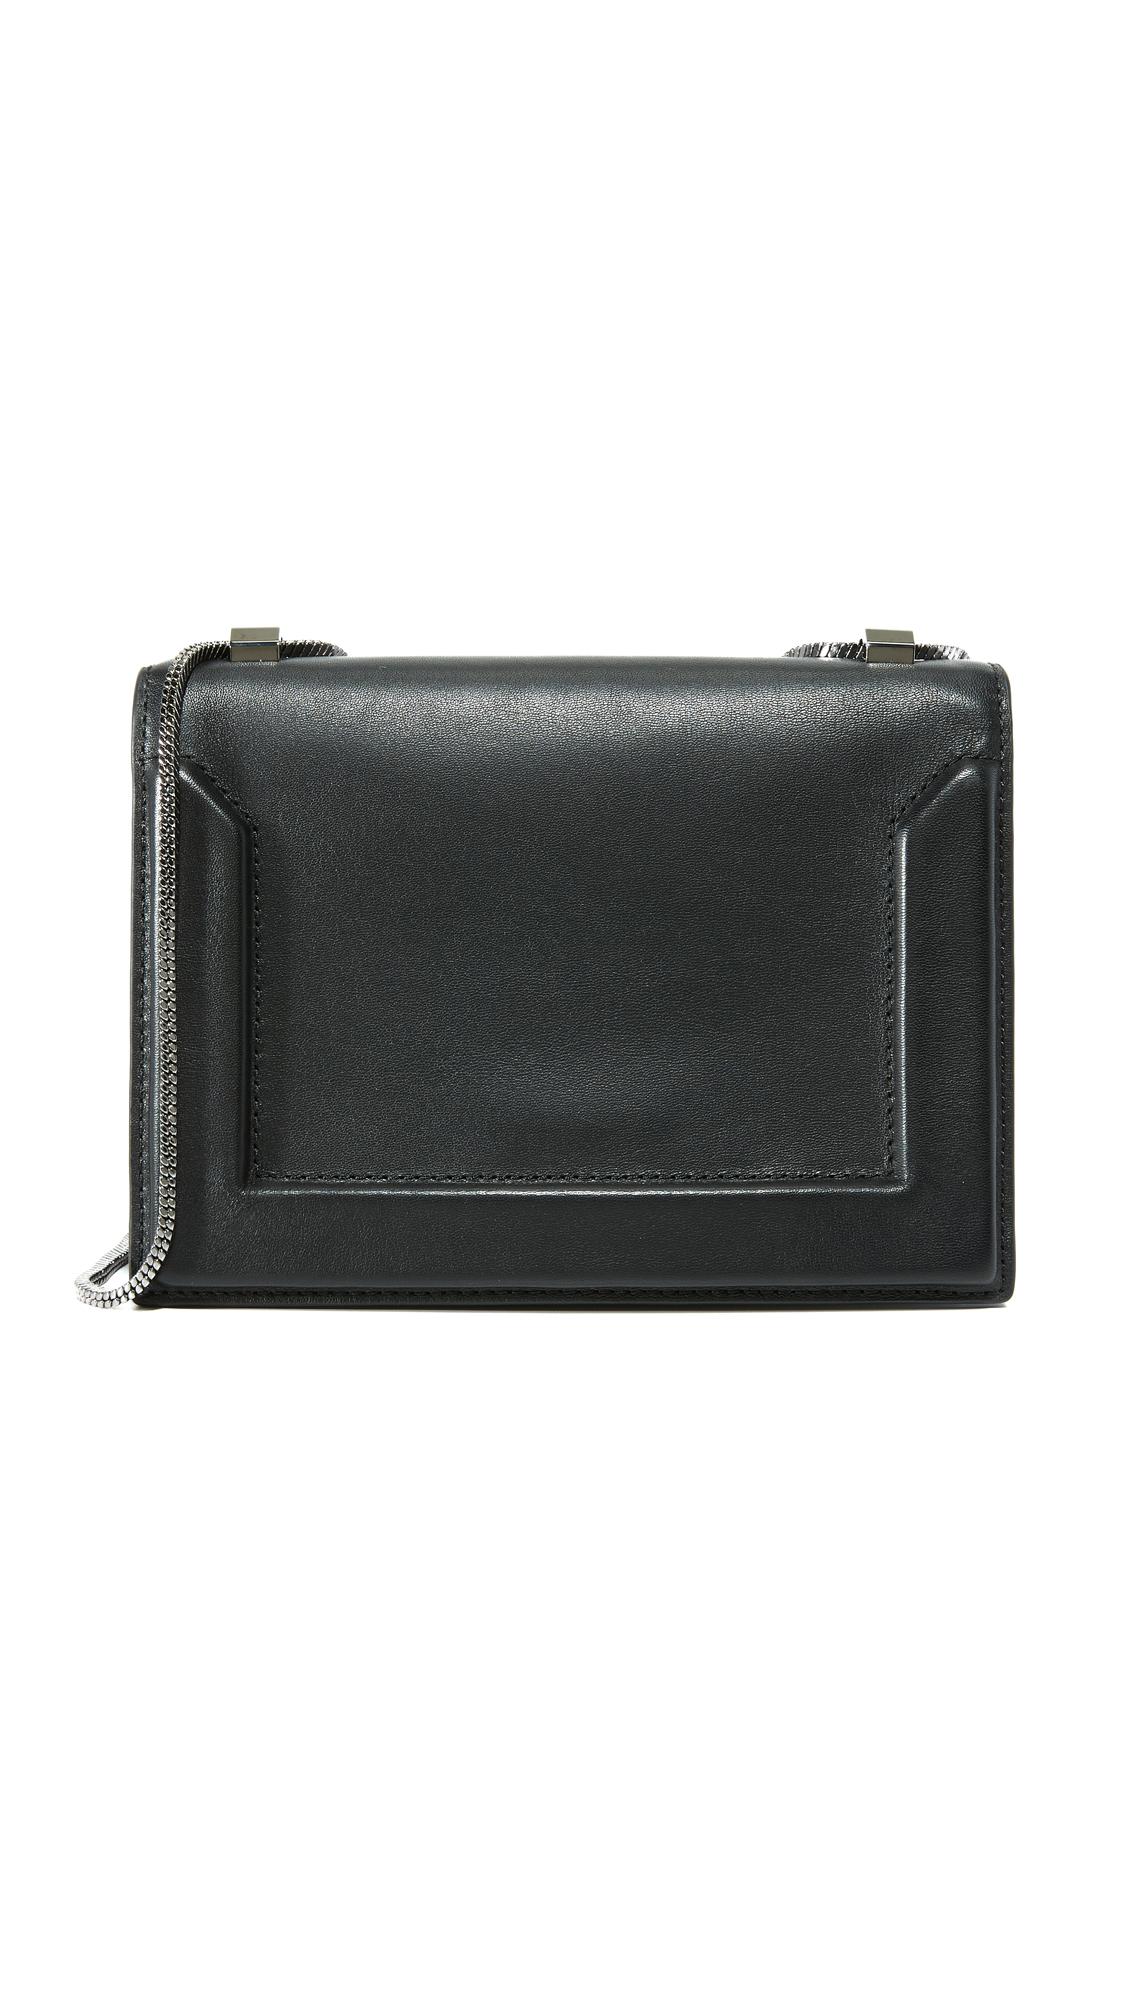 31 phillip lim female 31 phillip lim soleil mini chain shoulder bag black